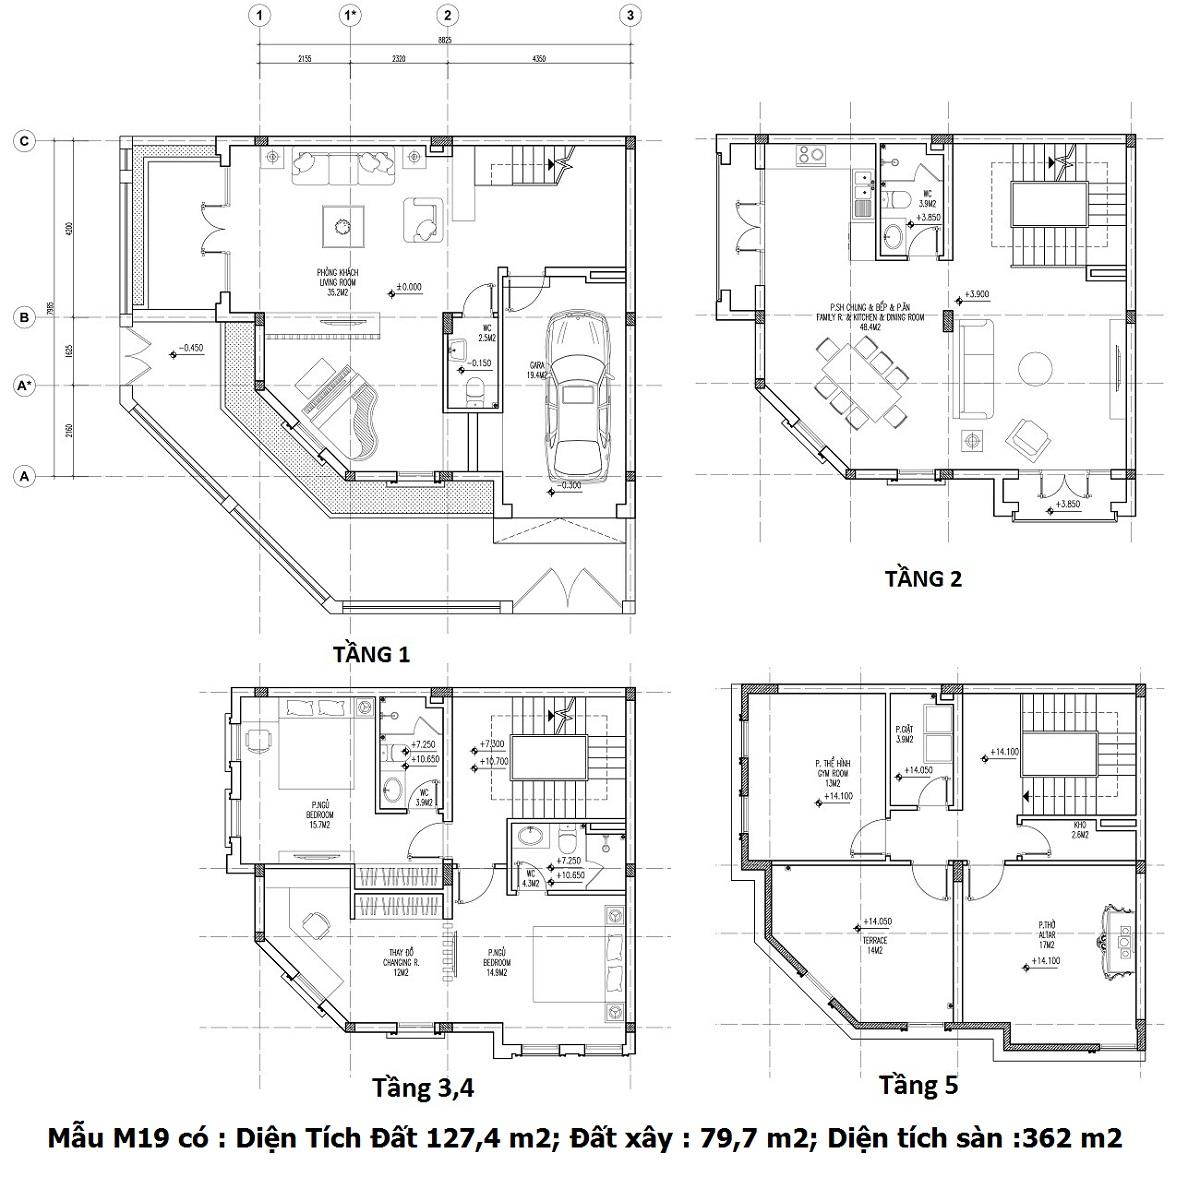 Mẫu thiết kế M19 Shophouse Larissa Đại Kim